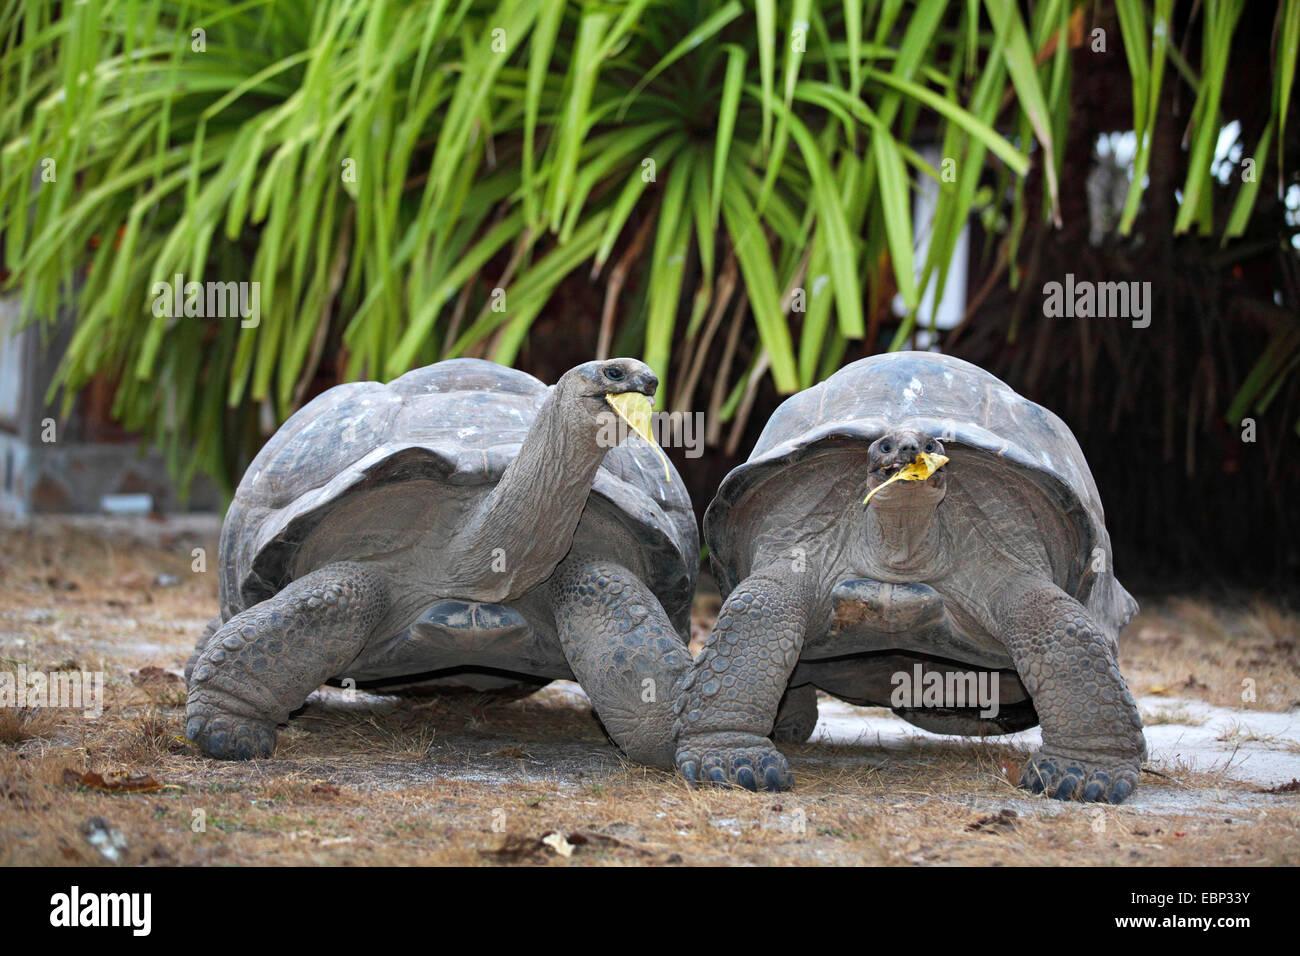 Seychelles giant tortoise, Aldabran giant tortoise, Aldabra giant tortoise (Aldabrachelys gigantea, Testudo gigantea, - Stock Image